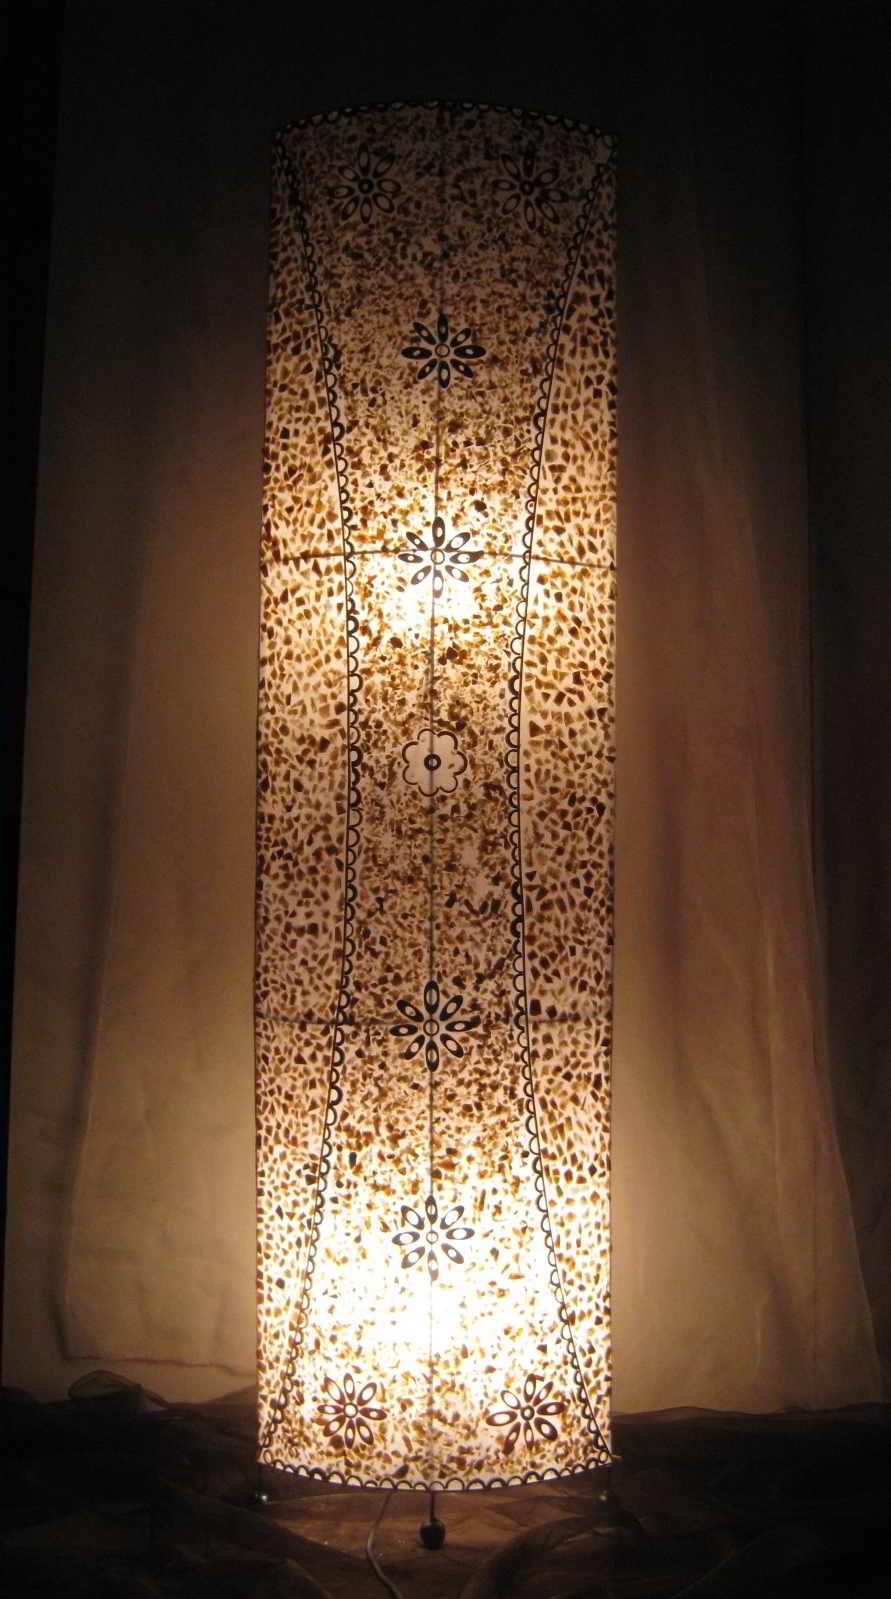 lampade a muro moderne : ... lampade etniche,lampade da parete e da muro,piantane moderne,appliques